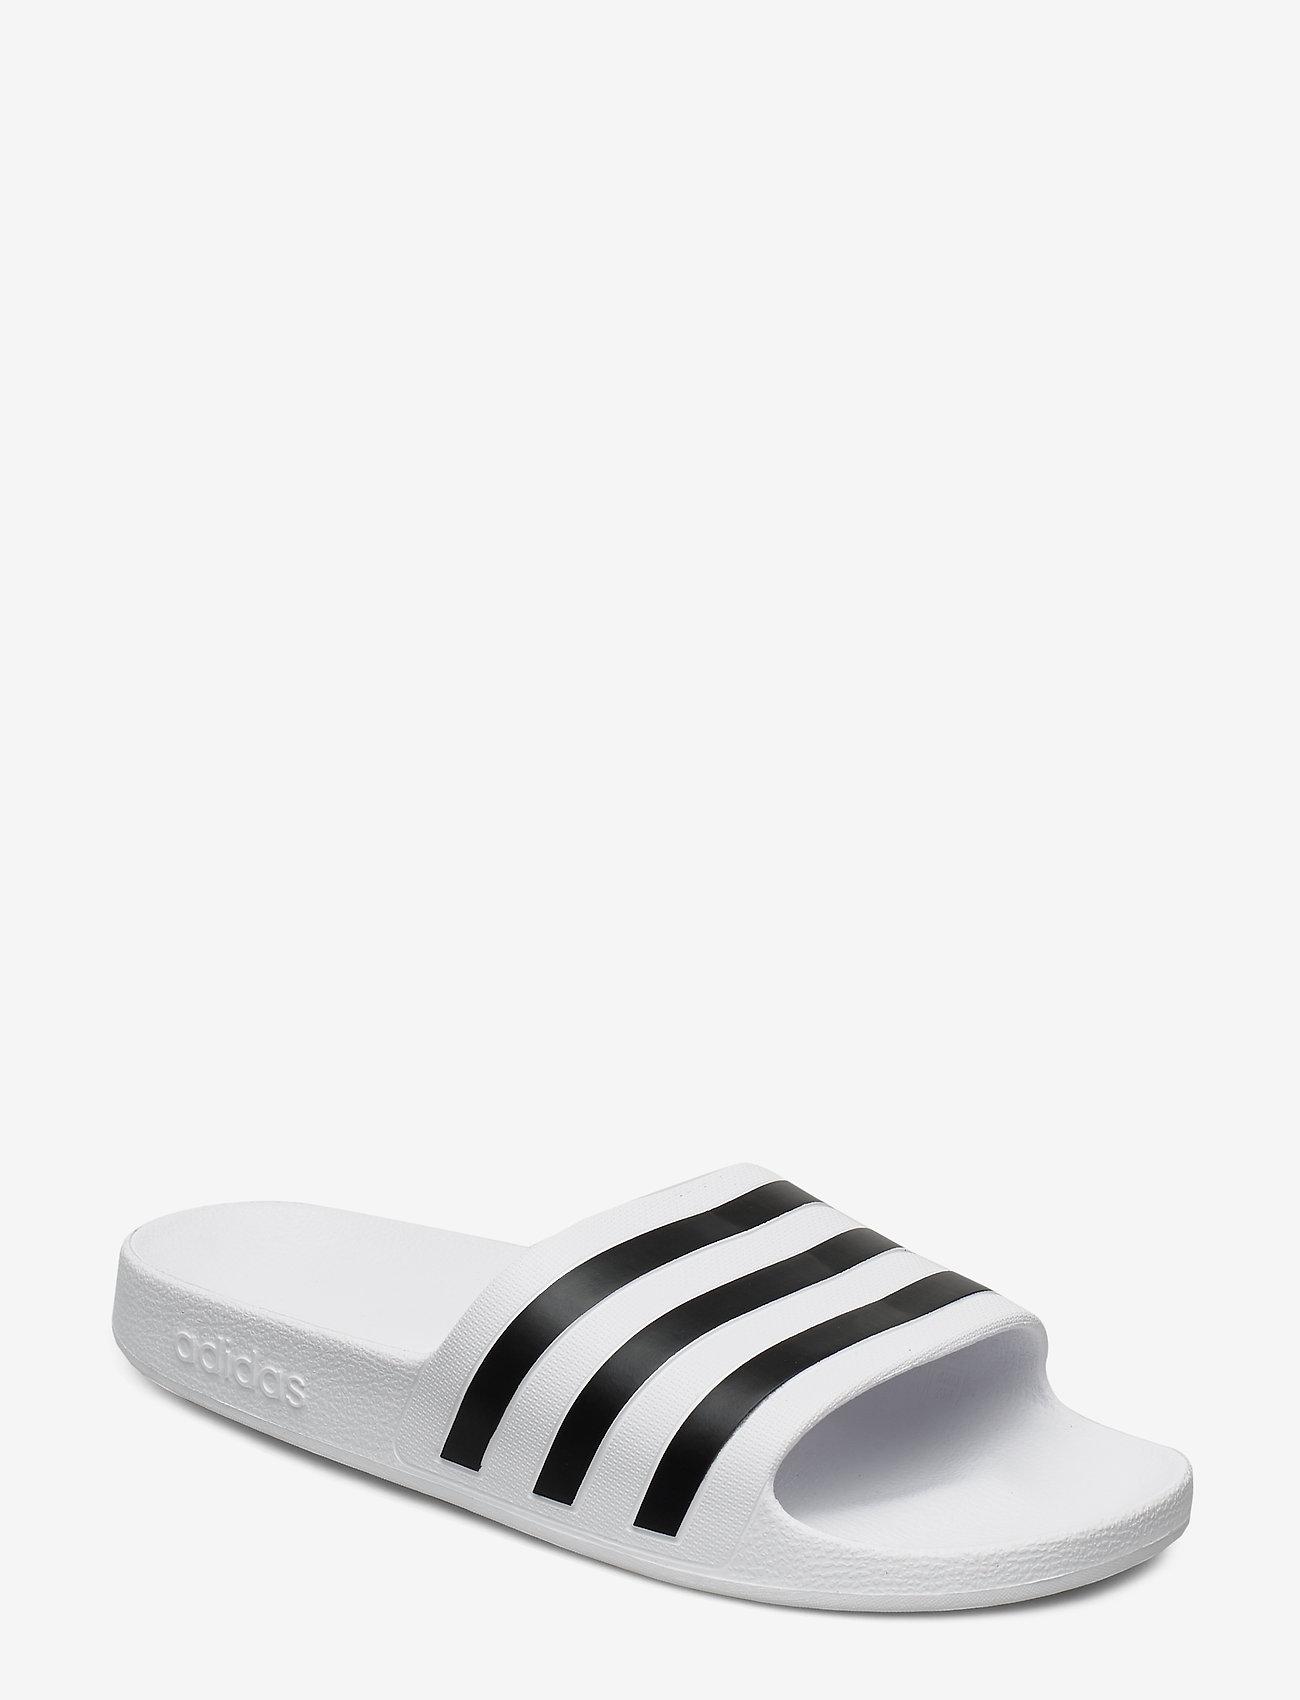 adidas Performance - ADILETTE AQUA - curseurs de piscine - ftwwht/cblack/ftwwht - 0